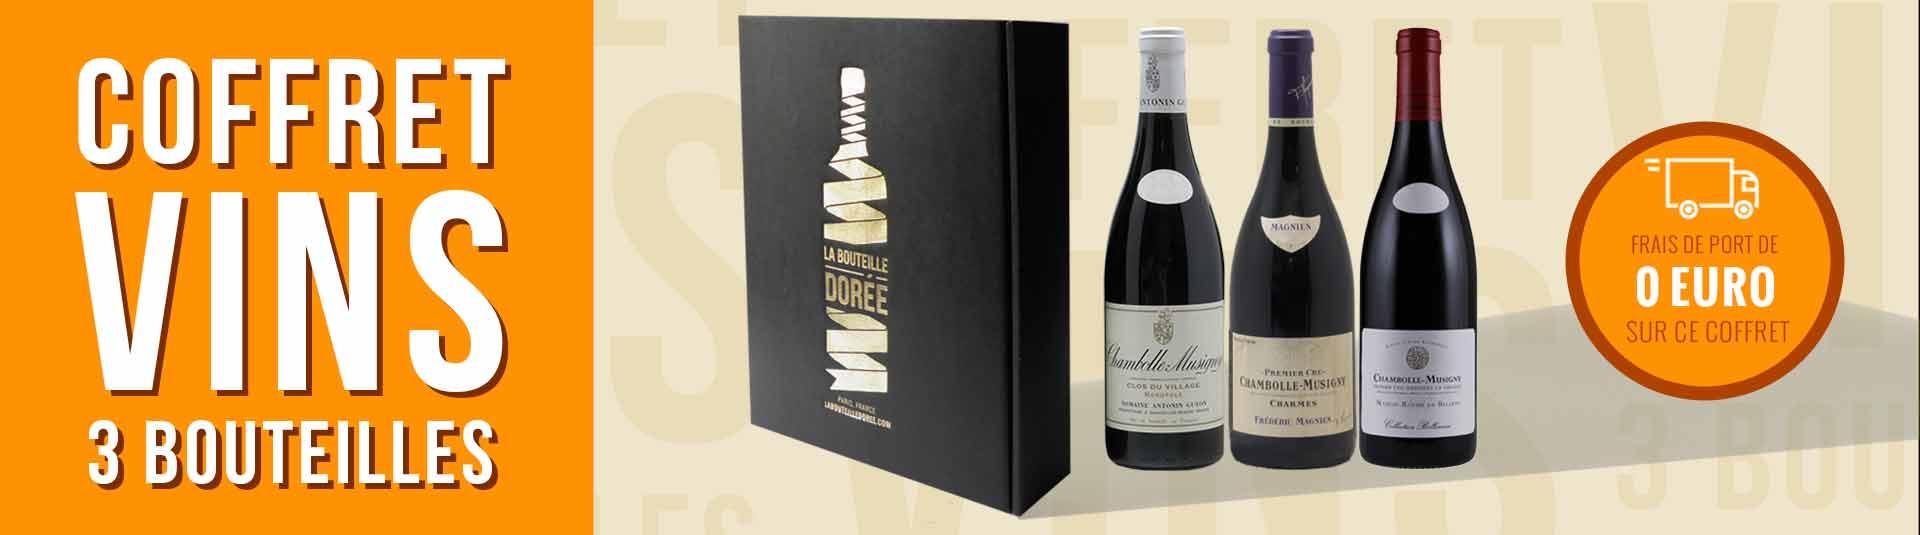 Coffret vin Bourgogne Prestige Chambolle-Musigny